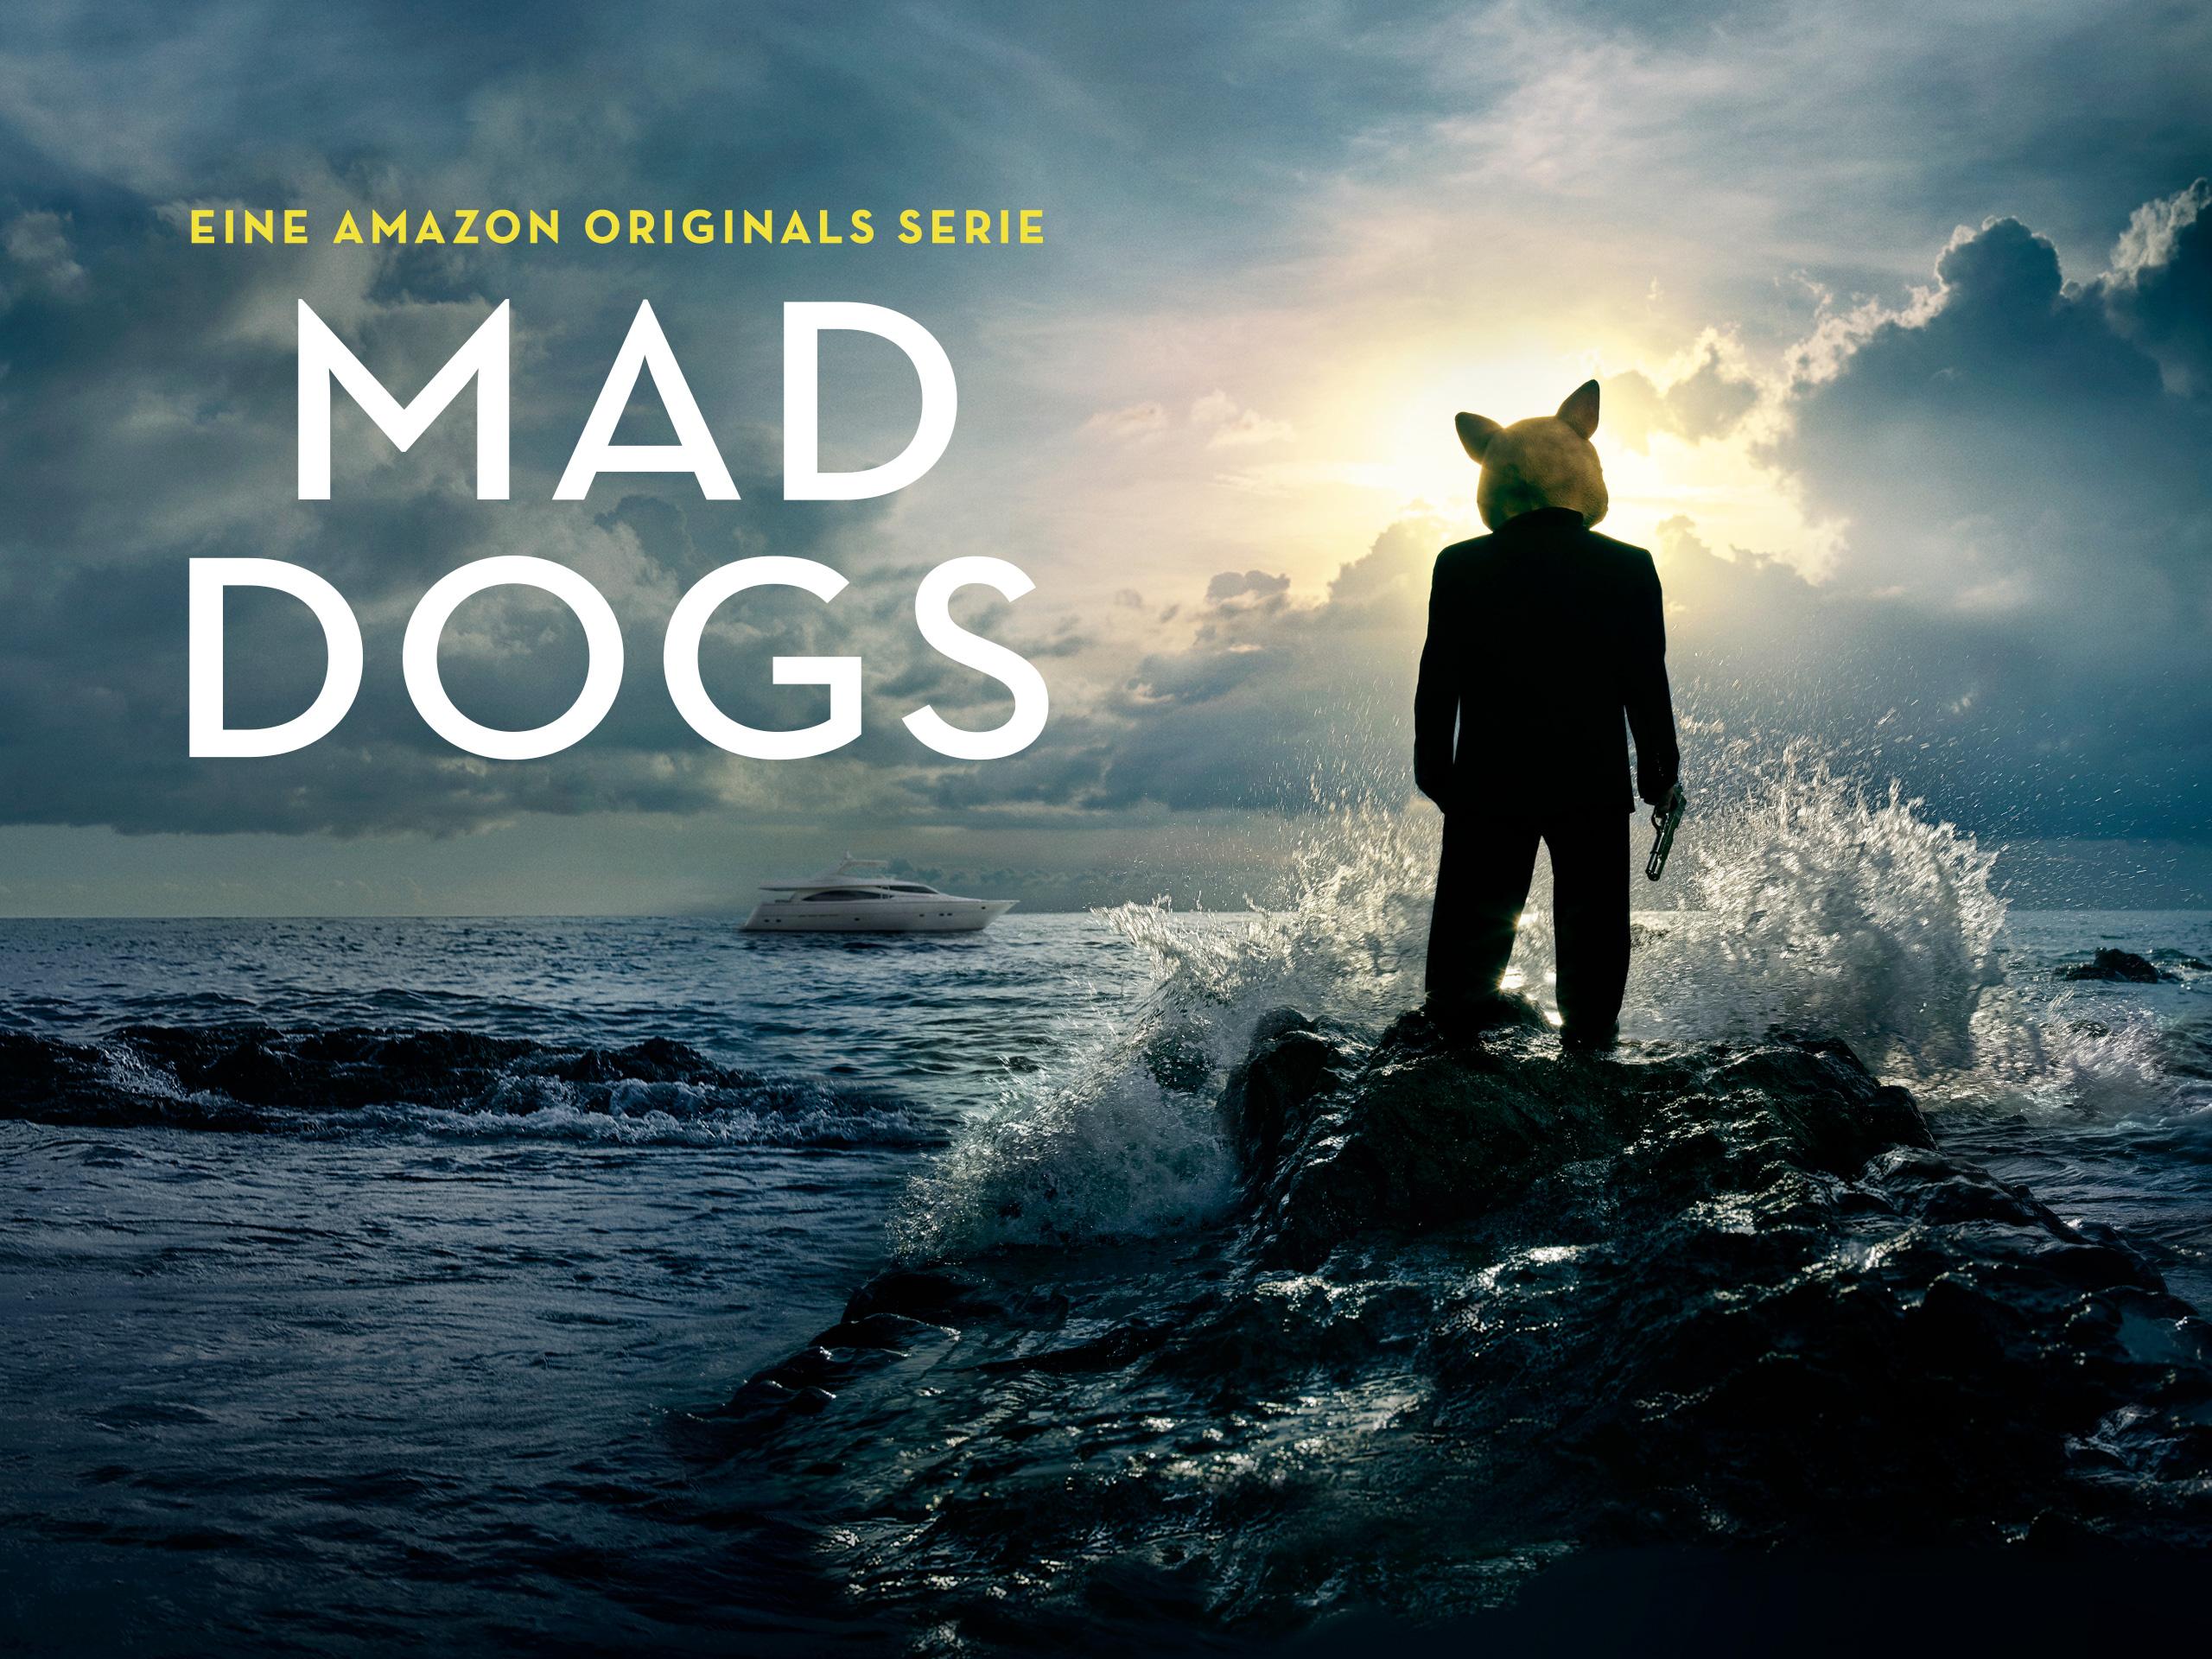 160120_PV_Mad Dogs_0_© 2016 Amazon.com Inc., or its affiliates